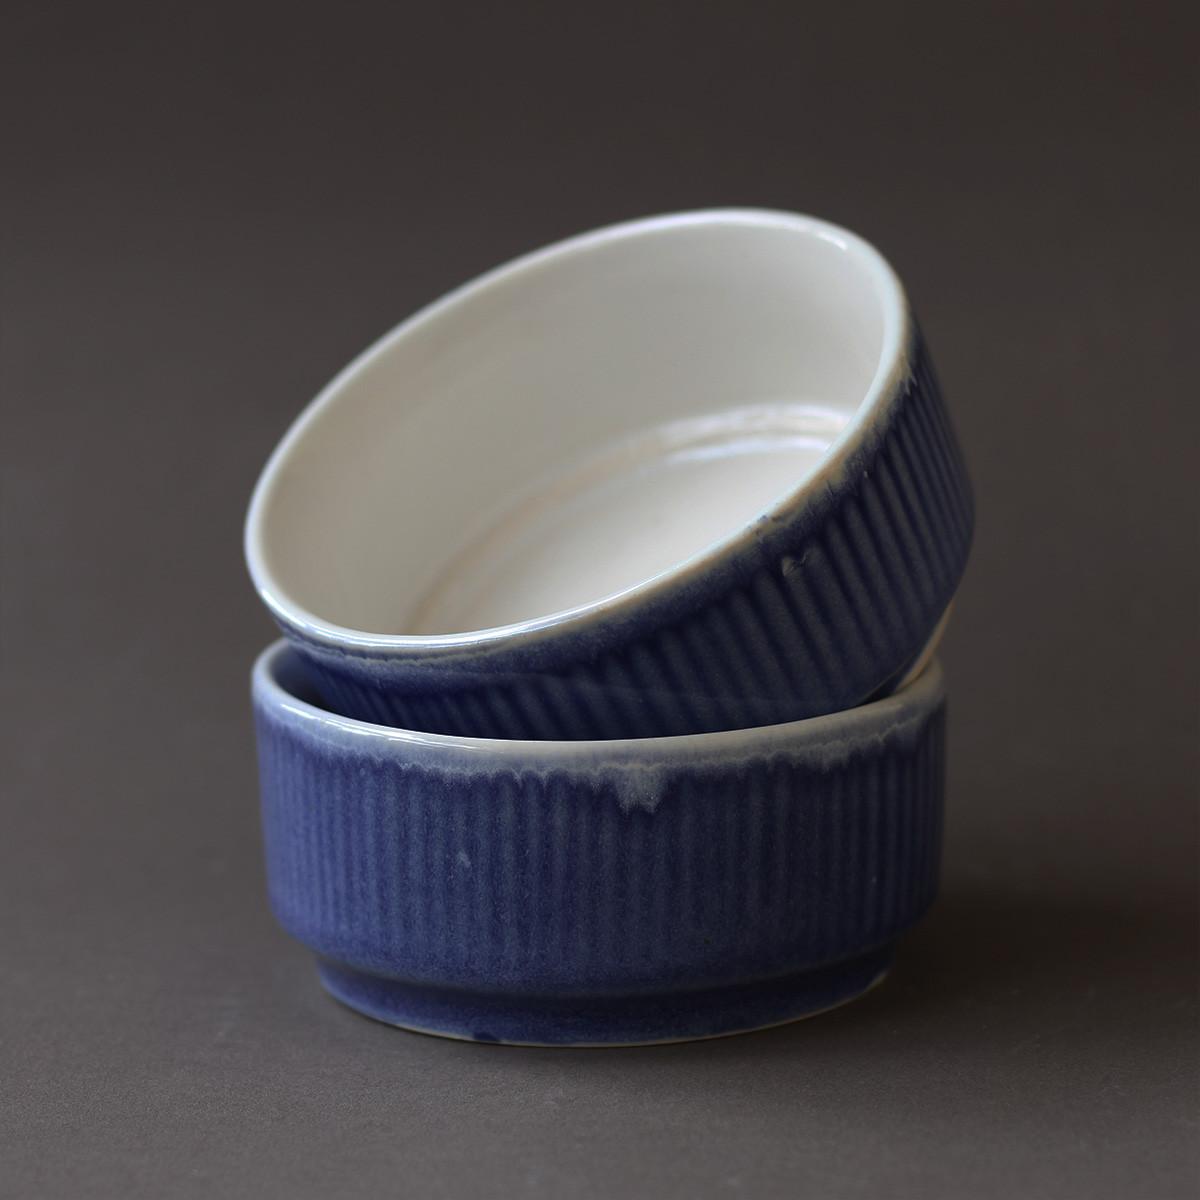 Handcrafted Ceramic Bowl(Blue)- Set of 2